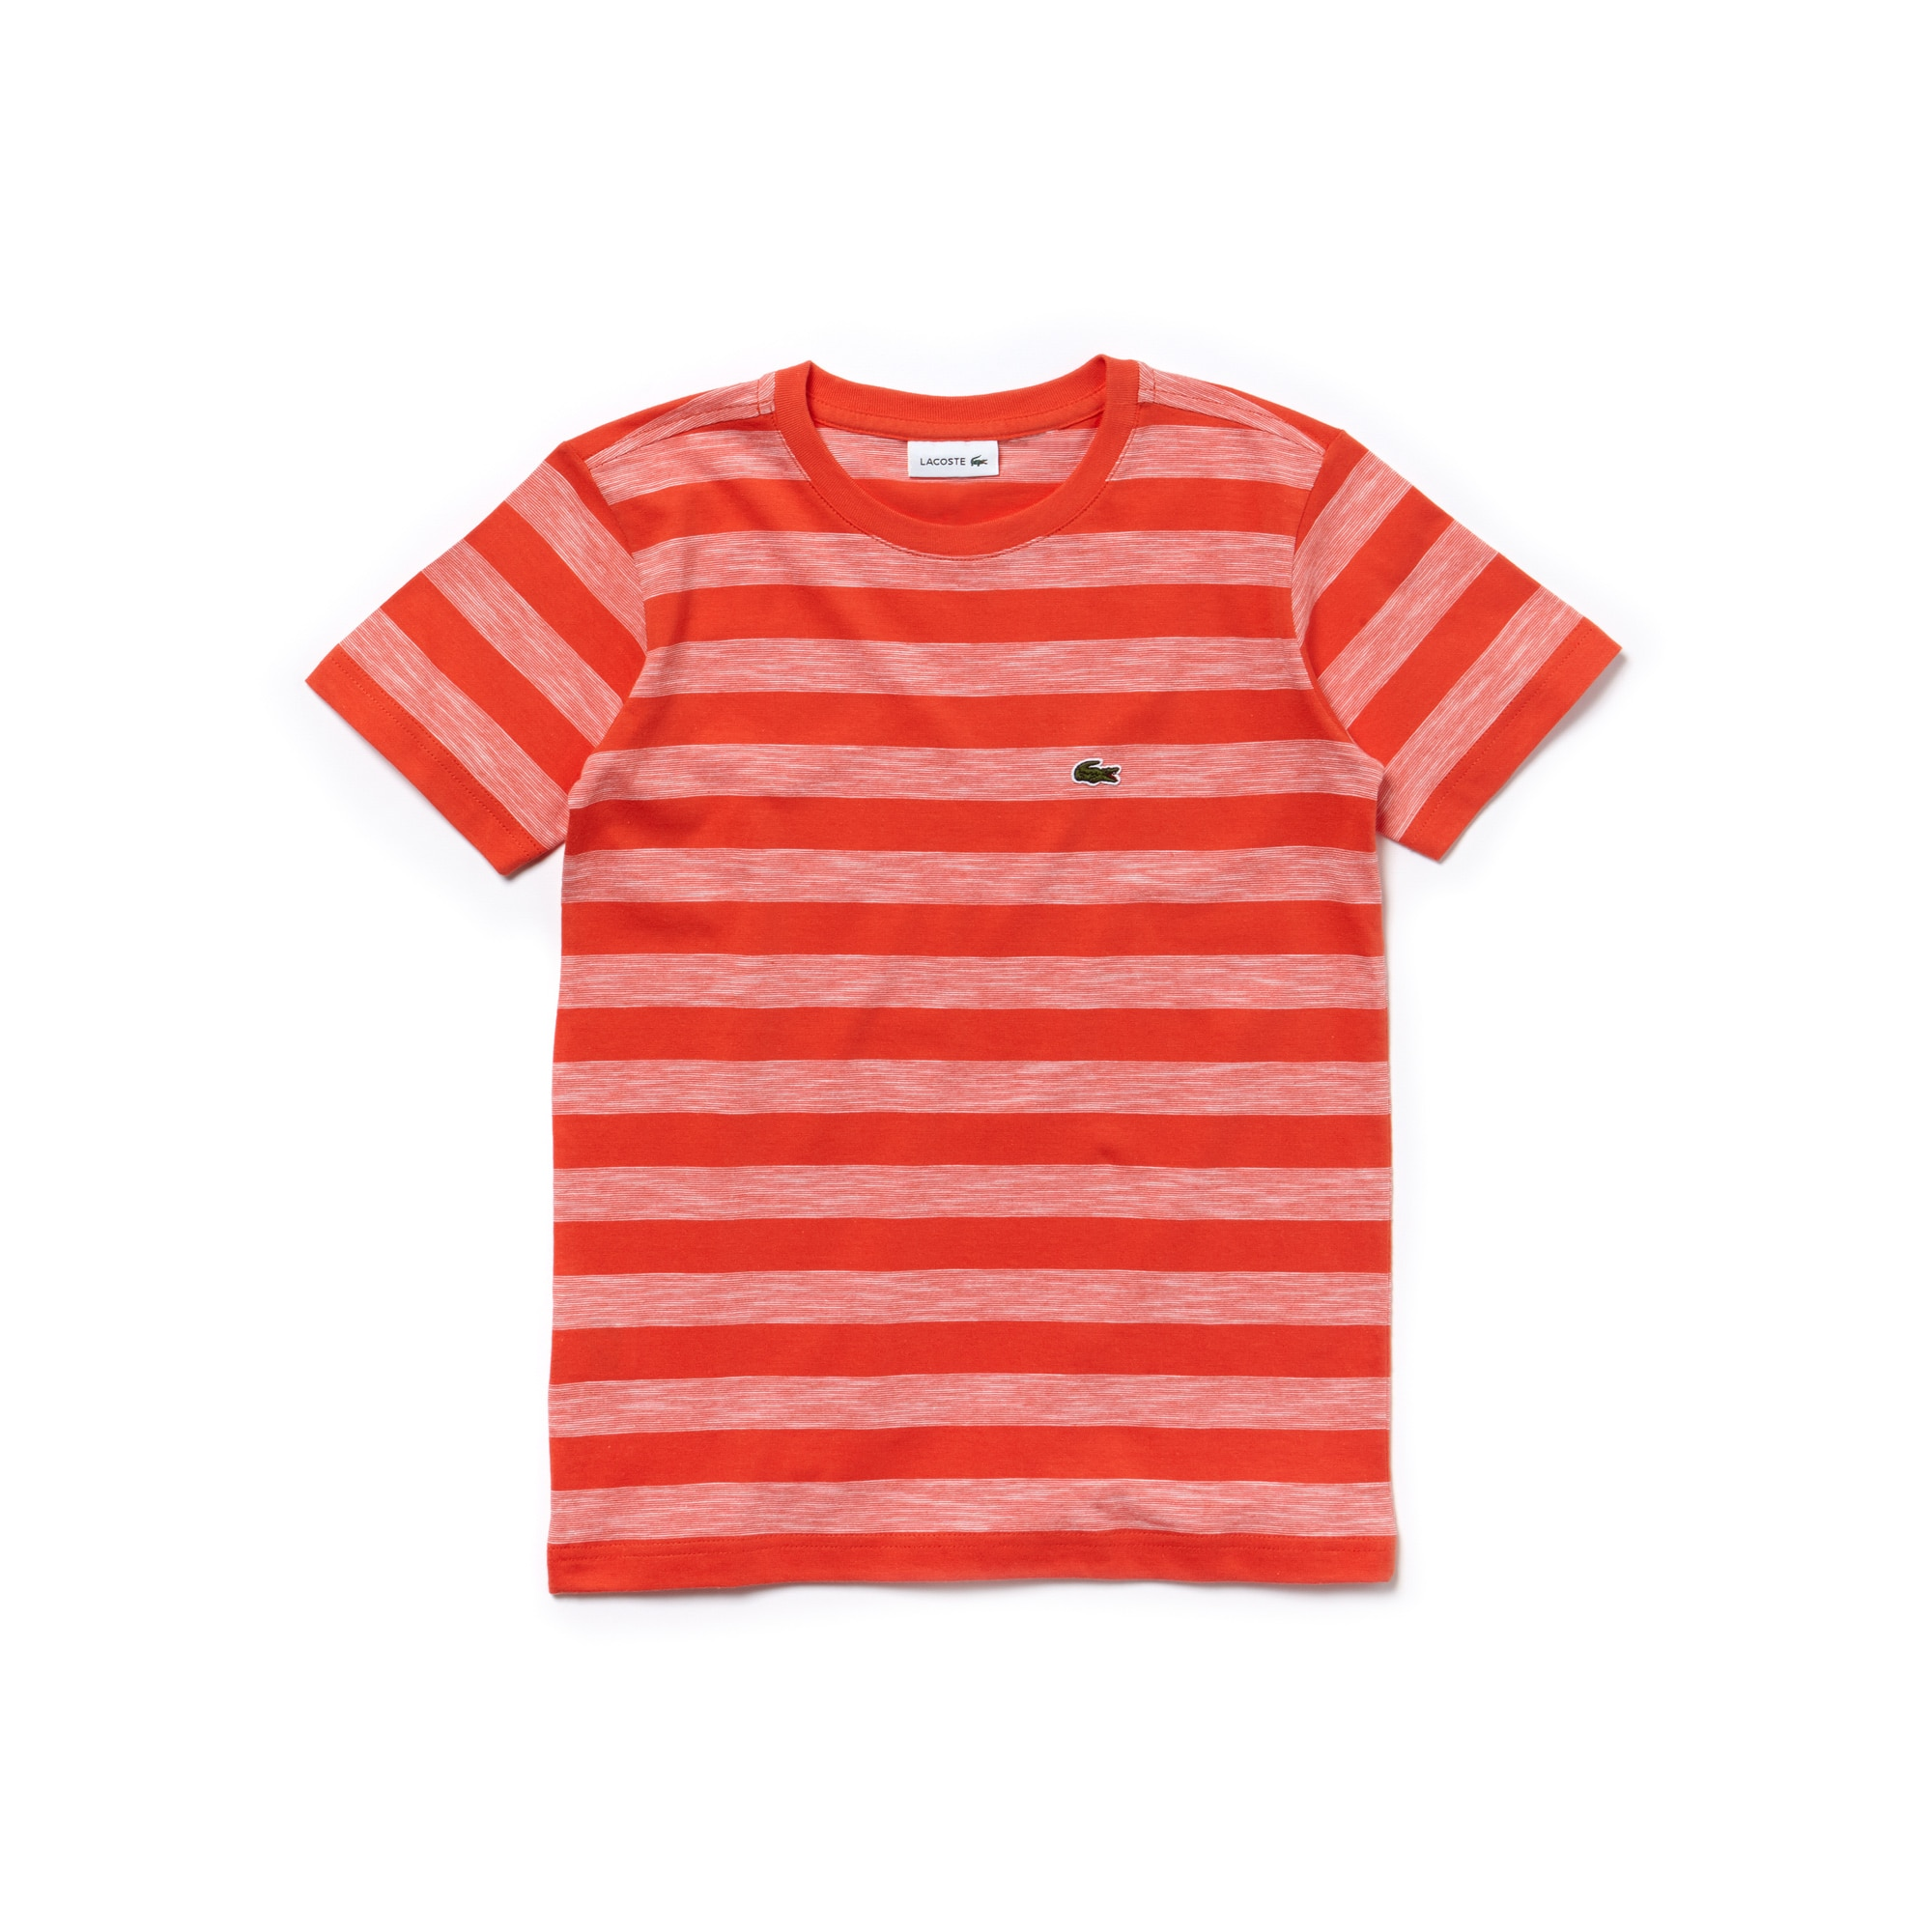 Jungen-Rundhals-T-Shirt aus gestreiftem Baumwolljersey